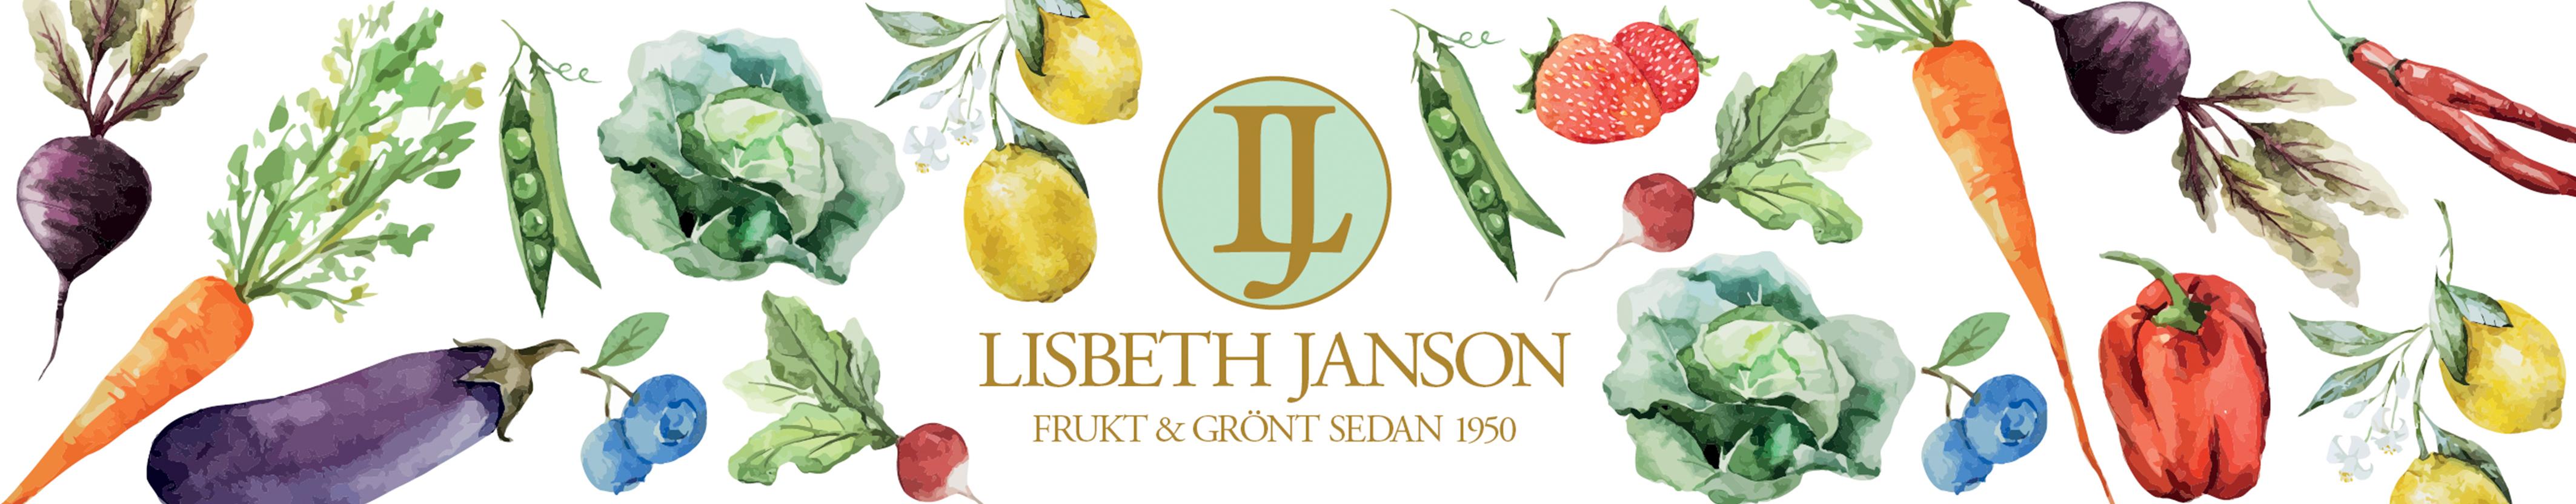 Lisbeth Janson Frukt & Grönt -